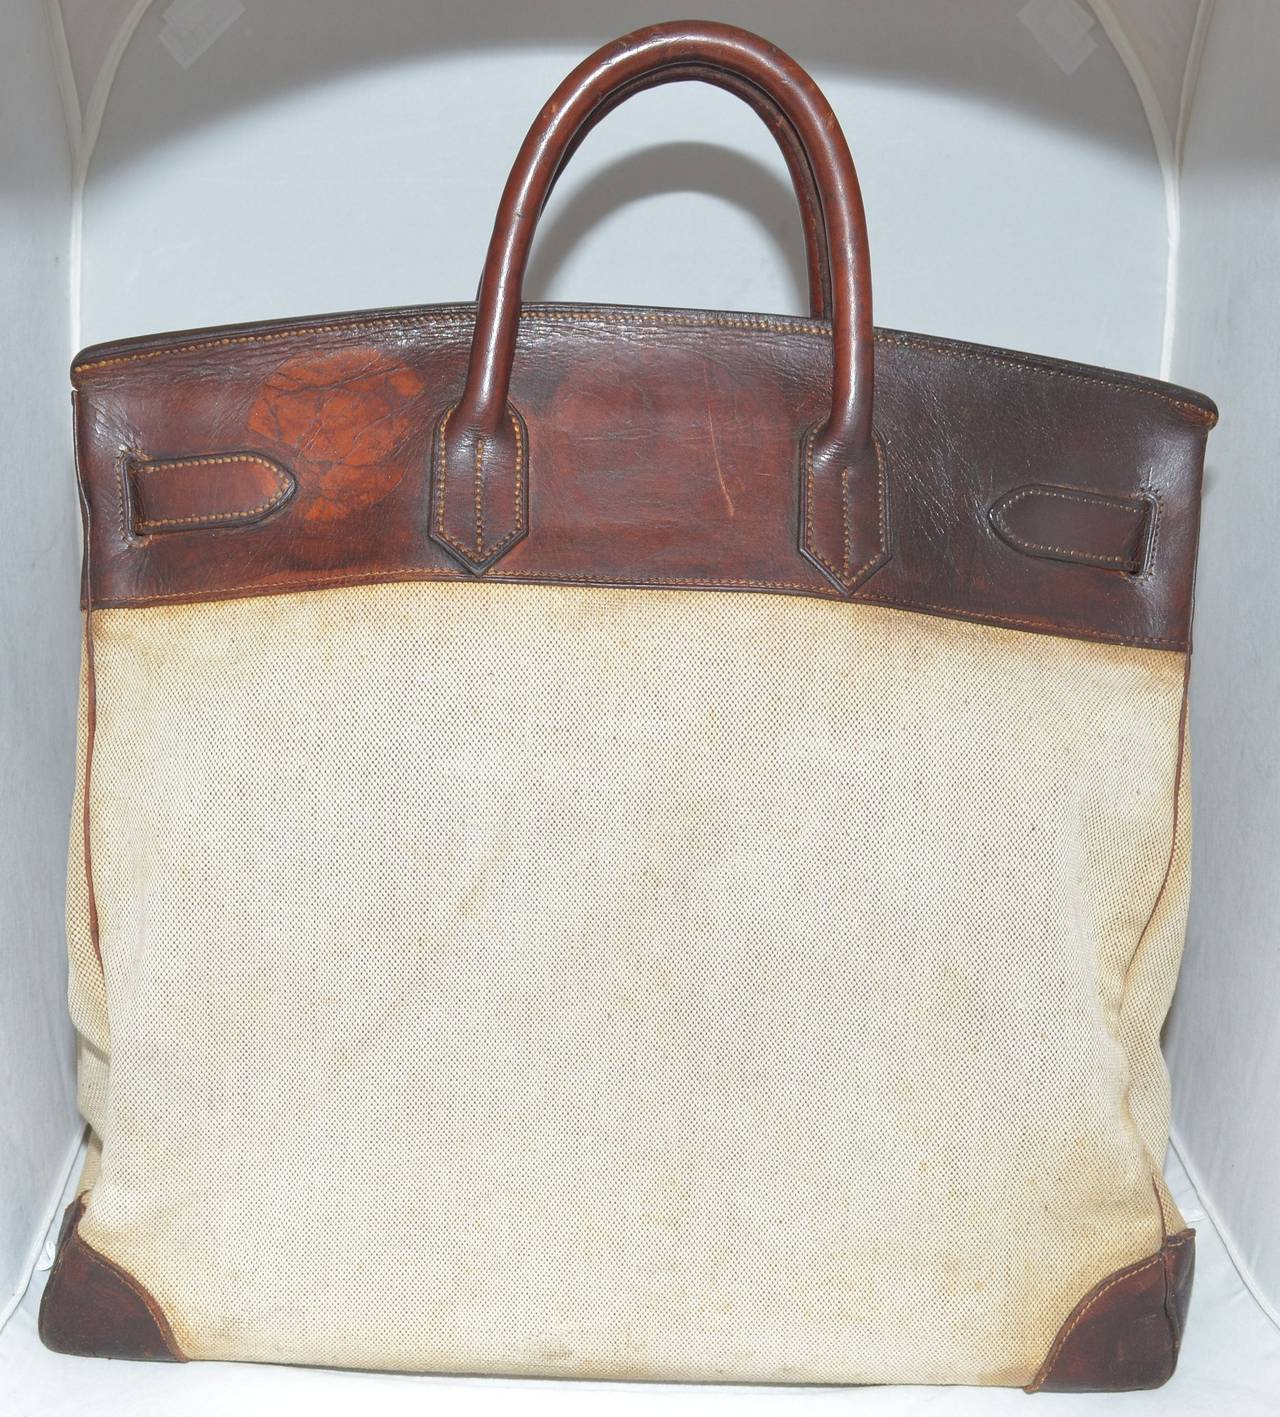 Hermes Vintage 1959 Haut a Courroie HAC Bag at 1stdibs